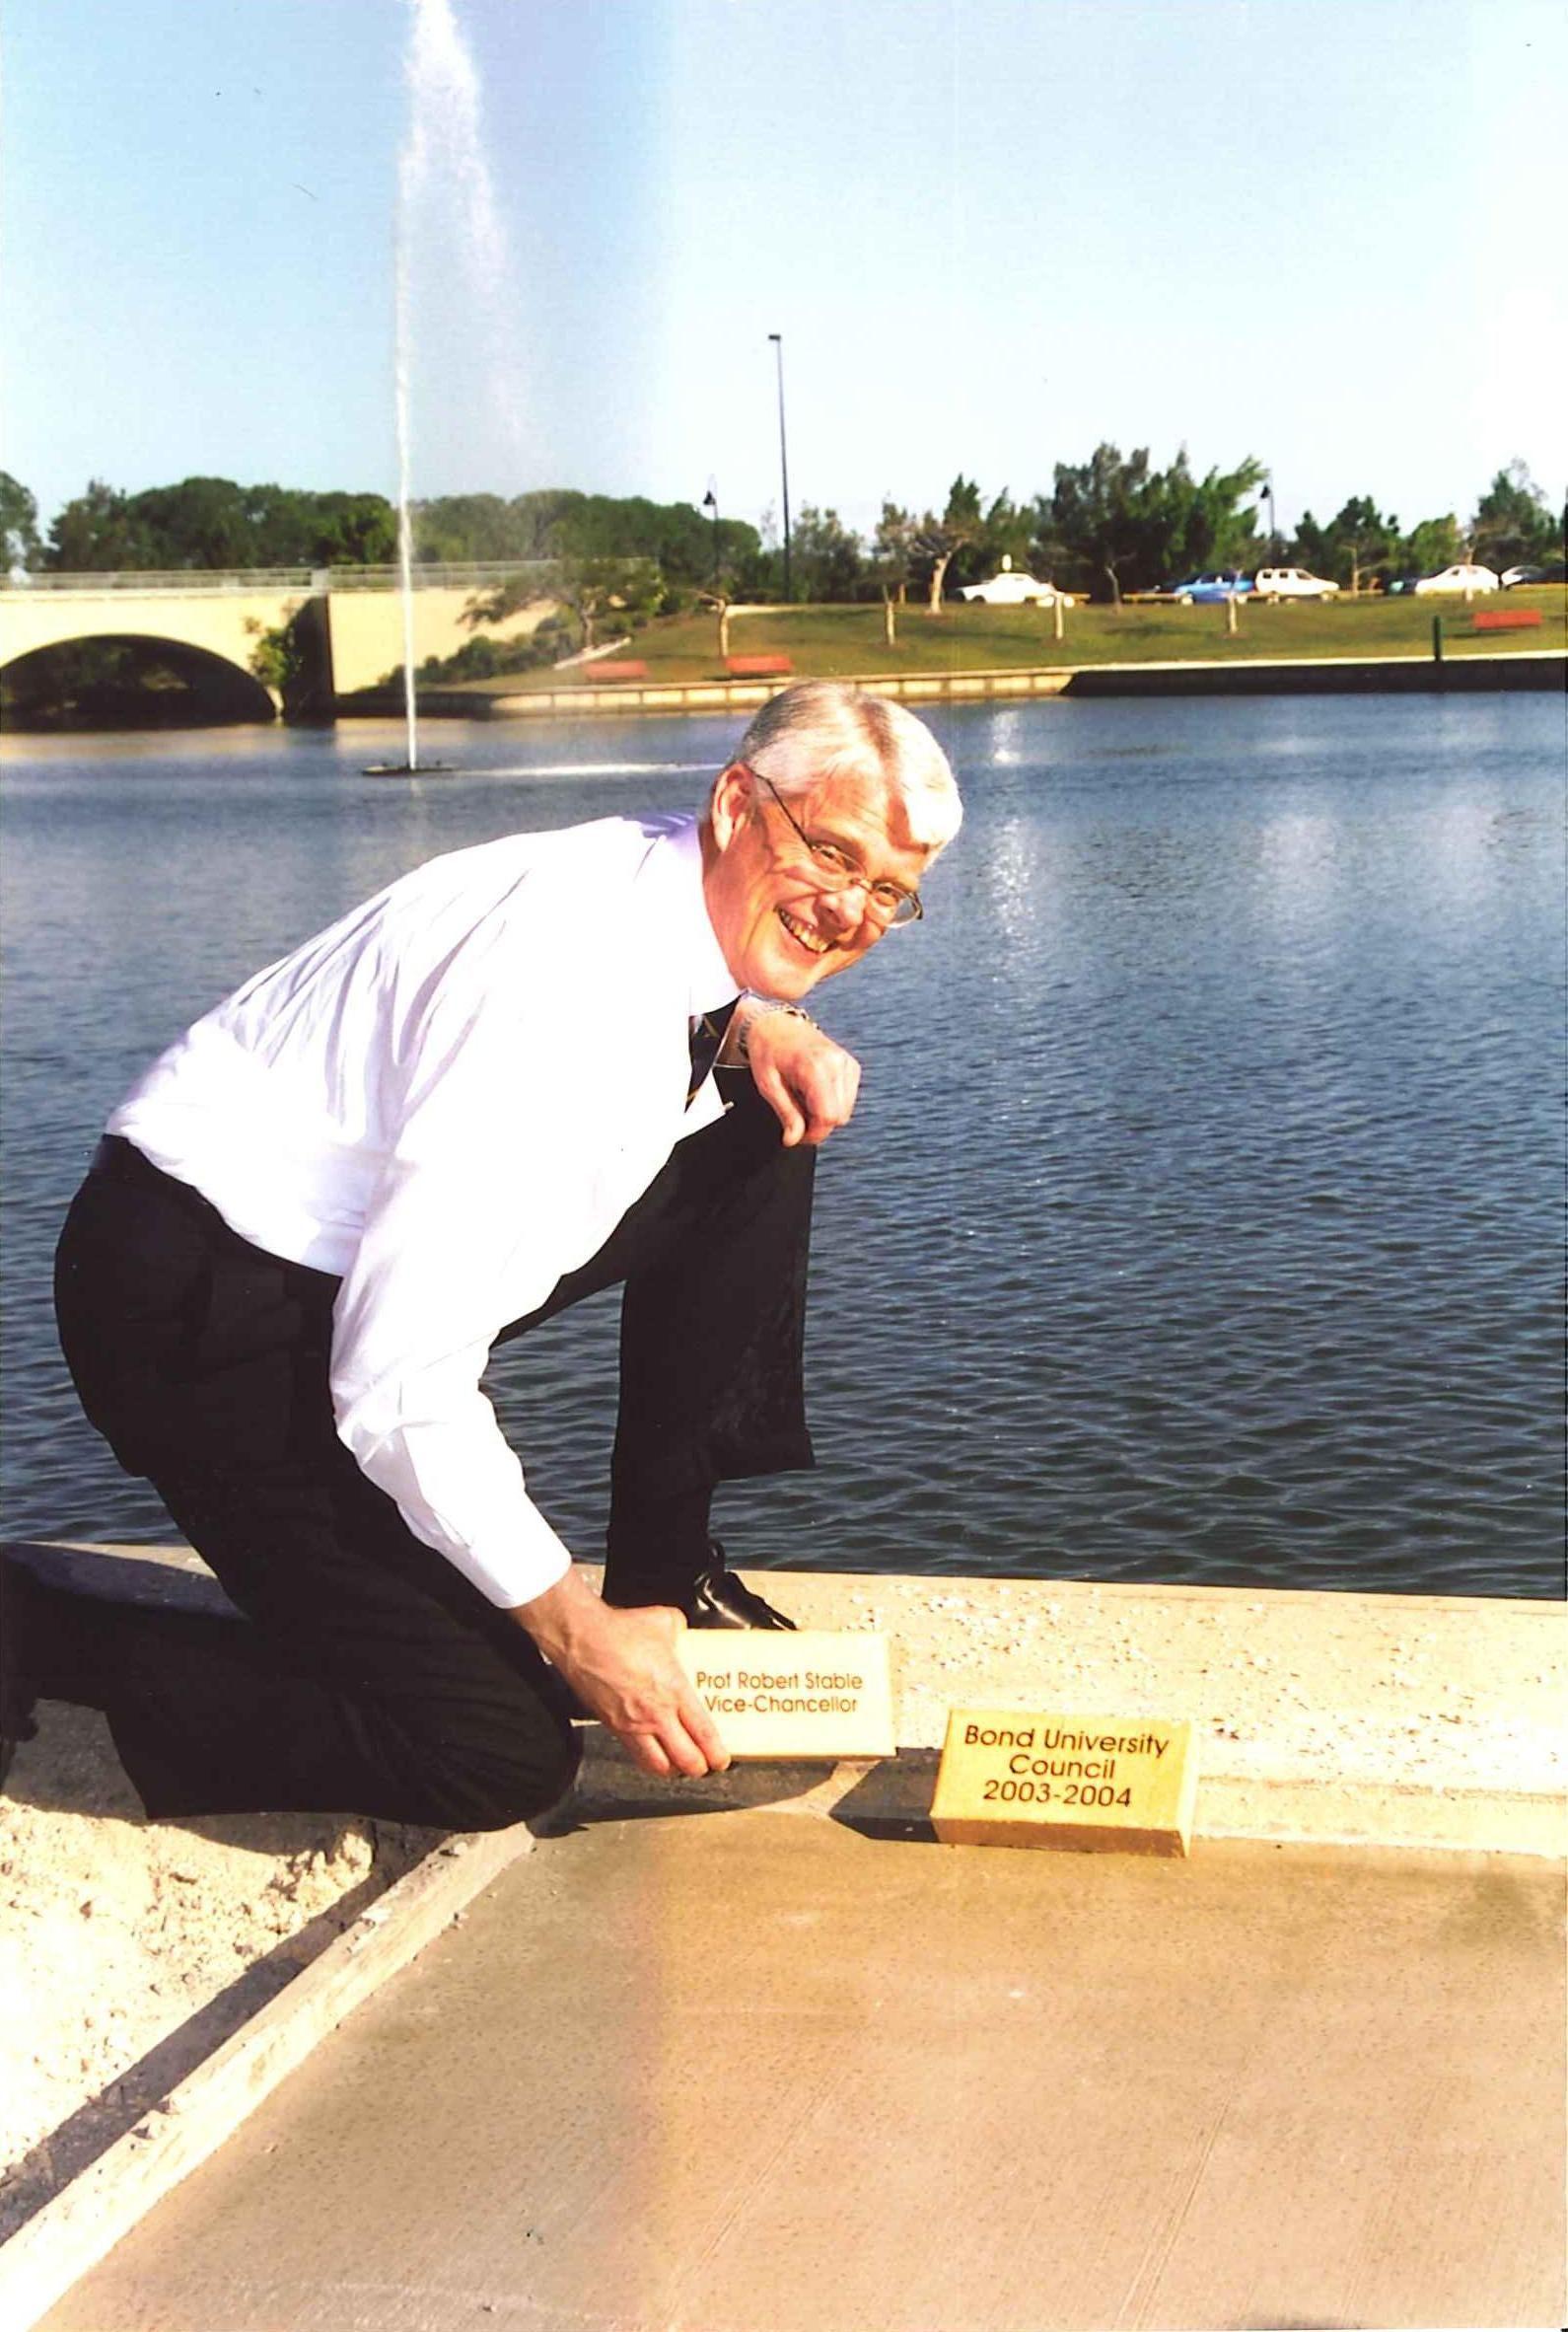 Emeritus Professor Robert Stable laying the first pavers at Bond University